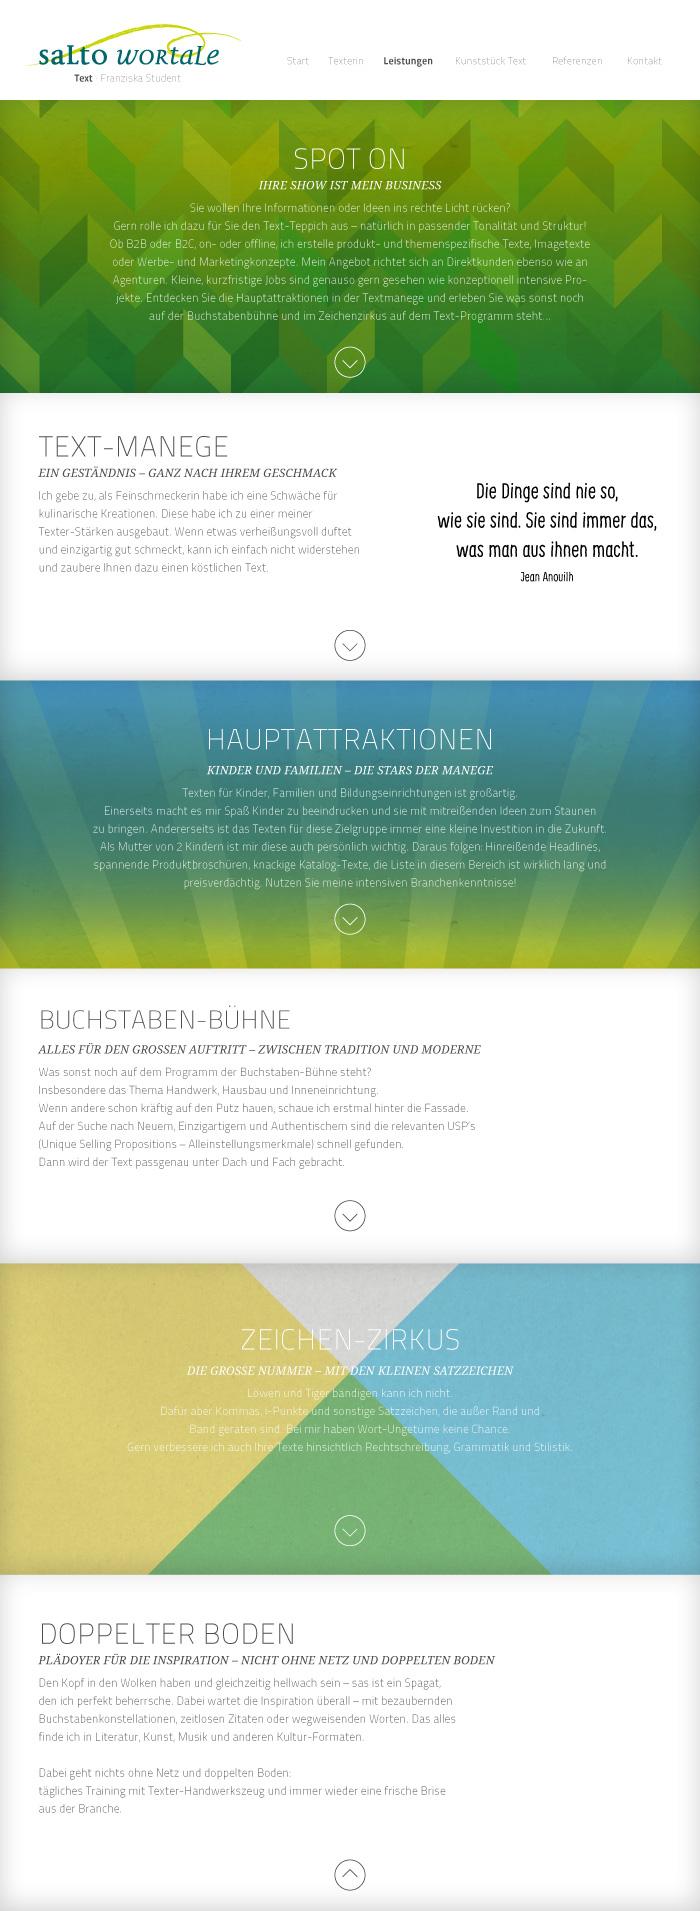 04_Franziska_Student_webdesign_wilkesmann